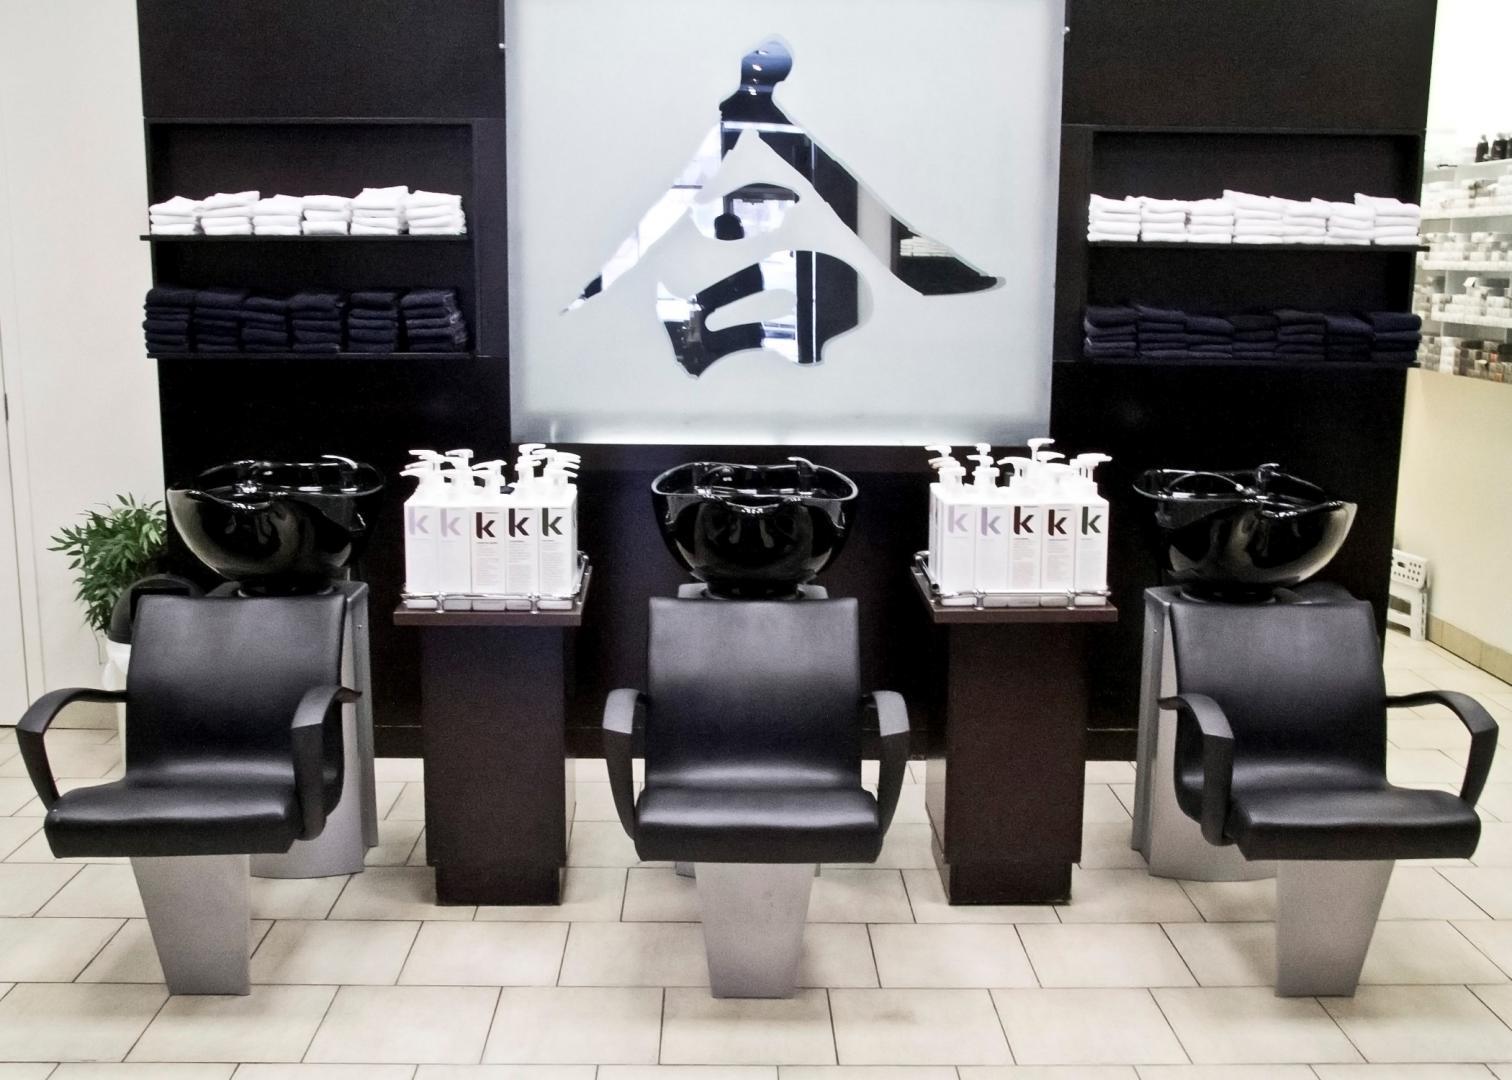 Salon de coiffure - Neufchâtel, Québec, Lebourgneuf | Harmonie ...